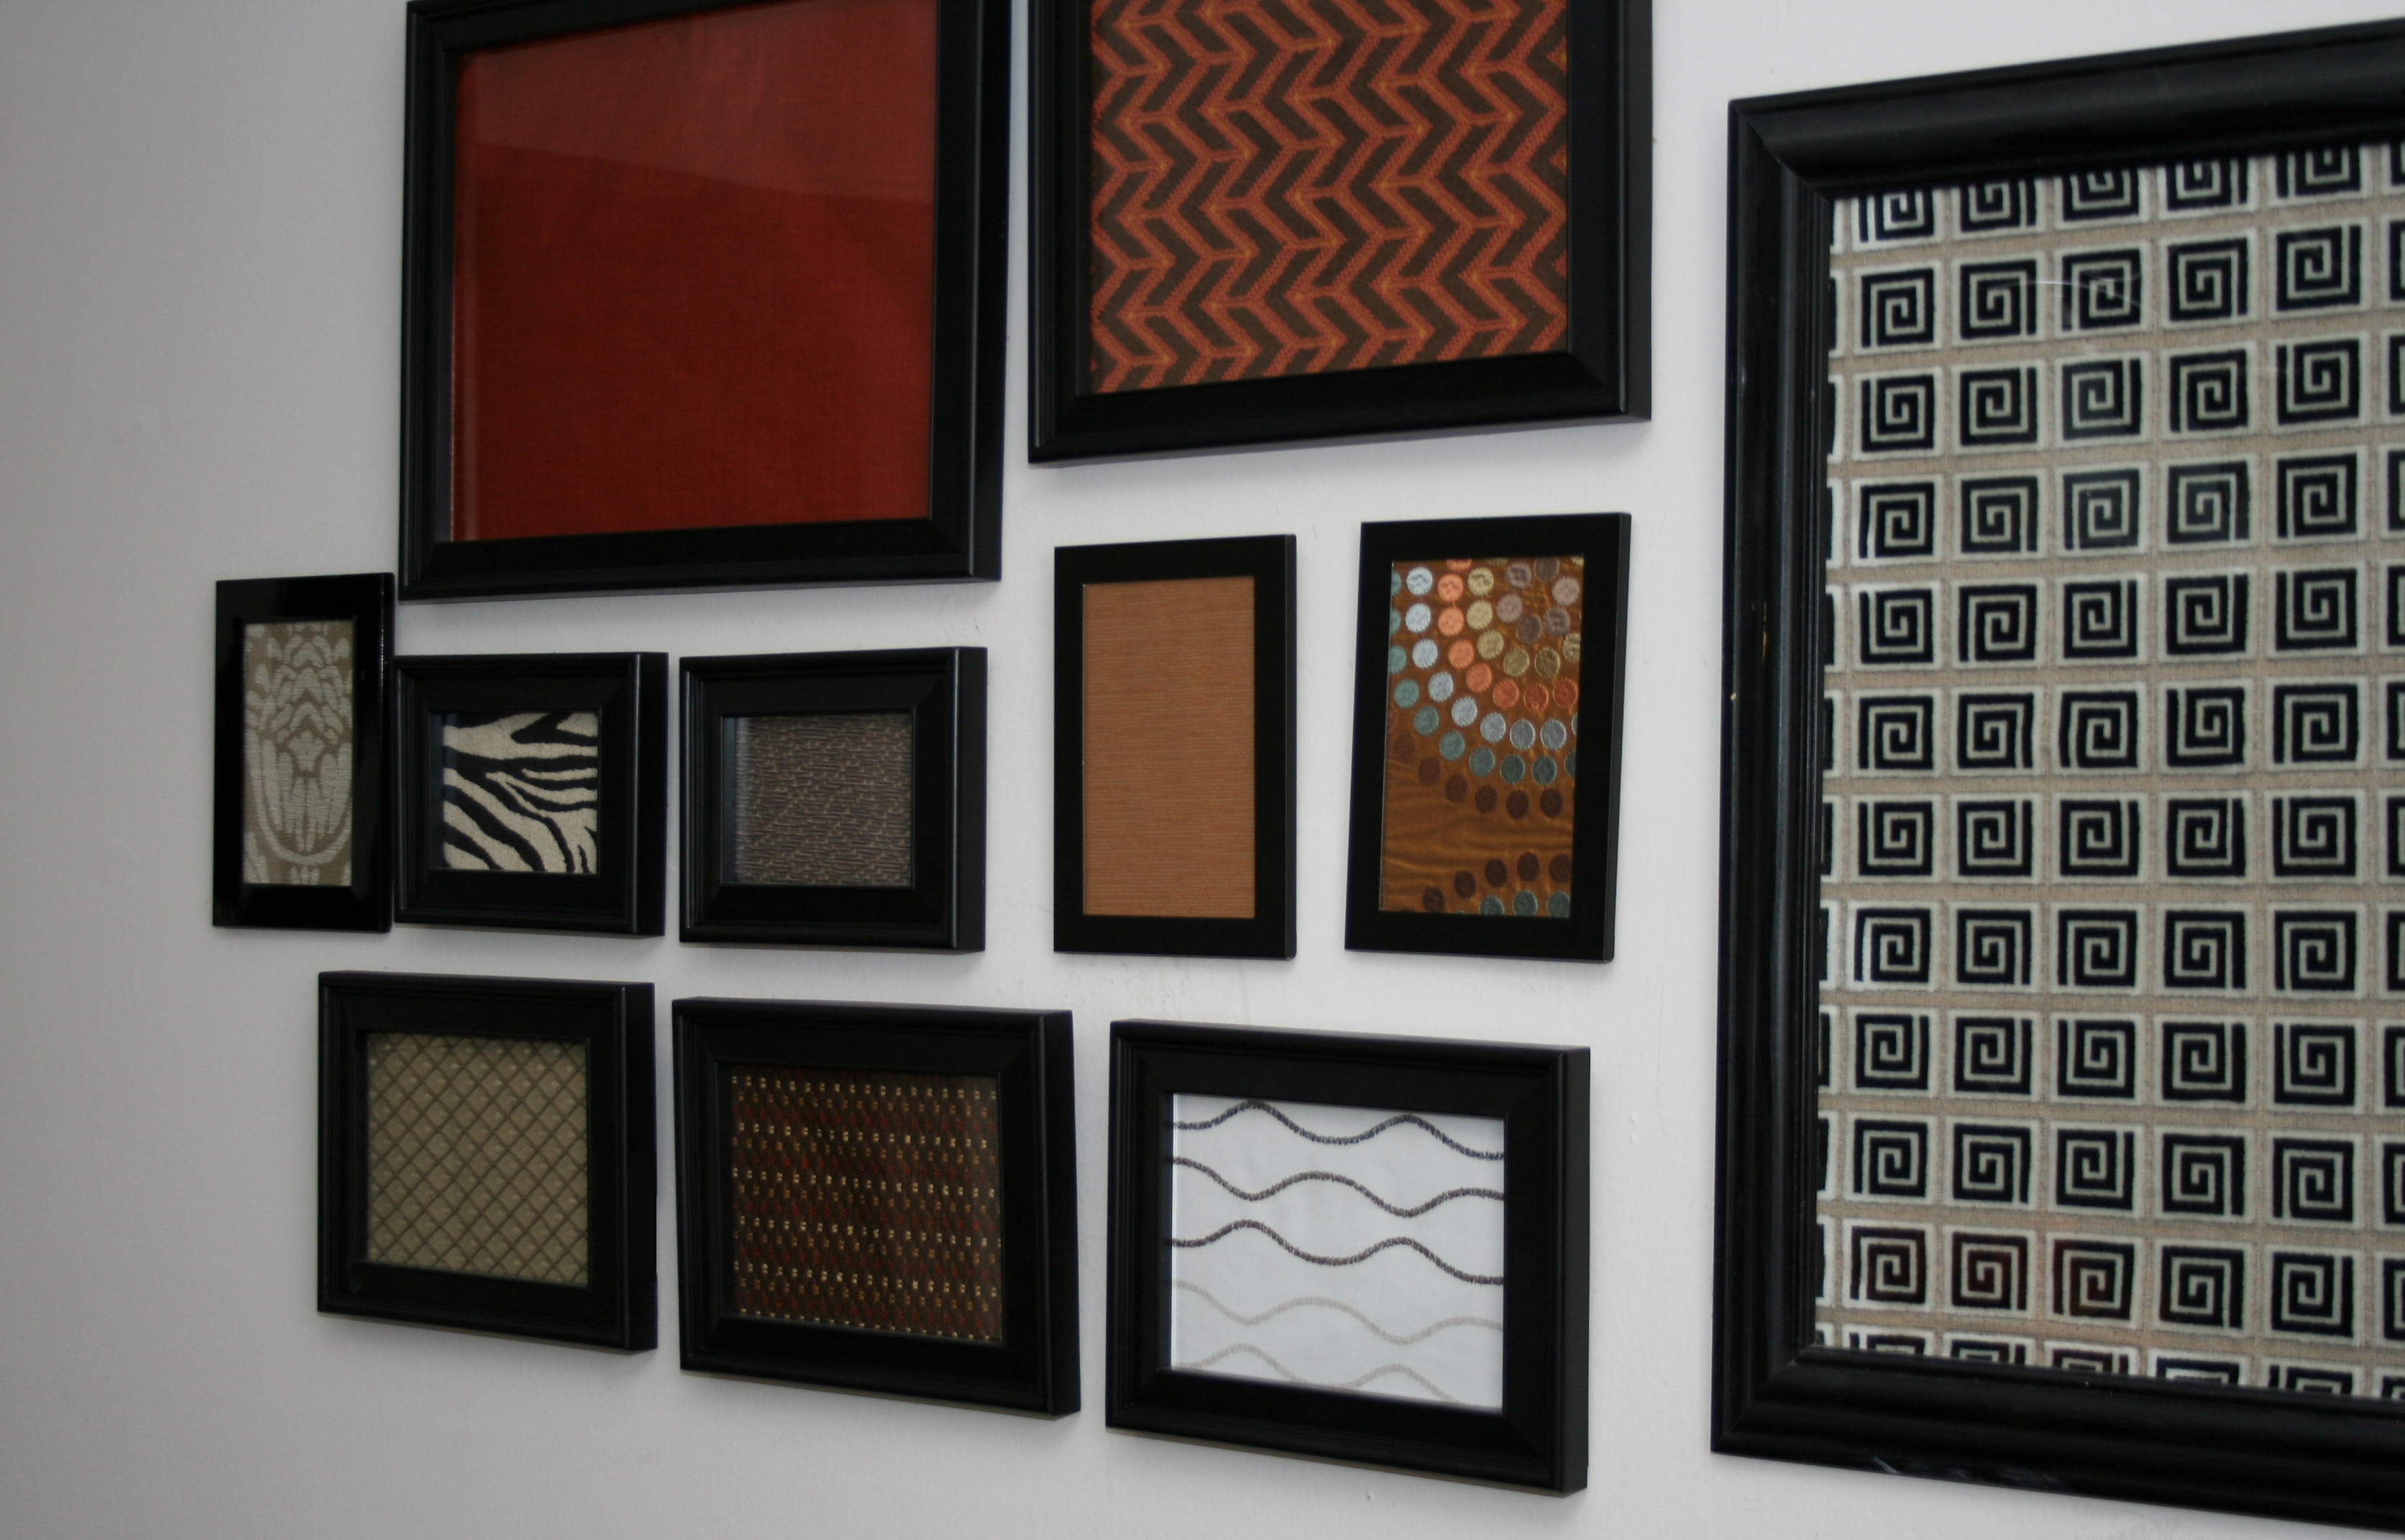 Framed Fabric Wall Art | Throughout 2017 Fabric Wall Art Frames (View 12 of 15)